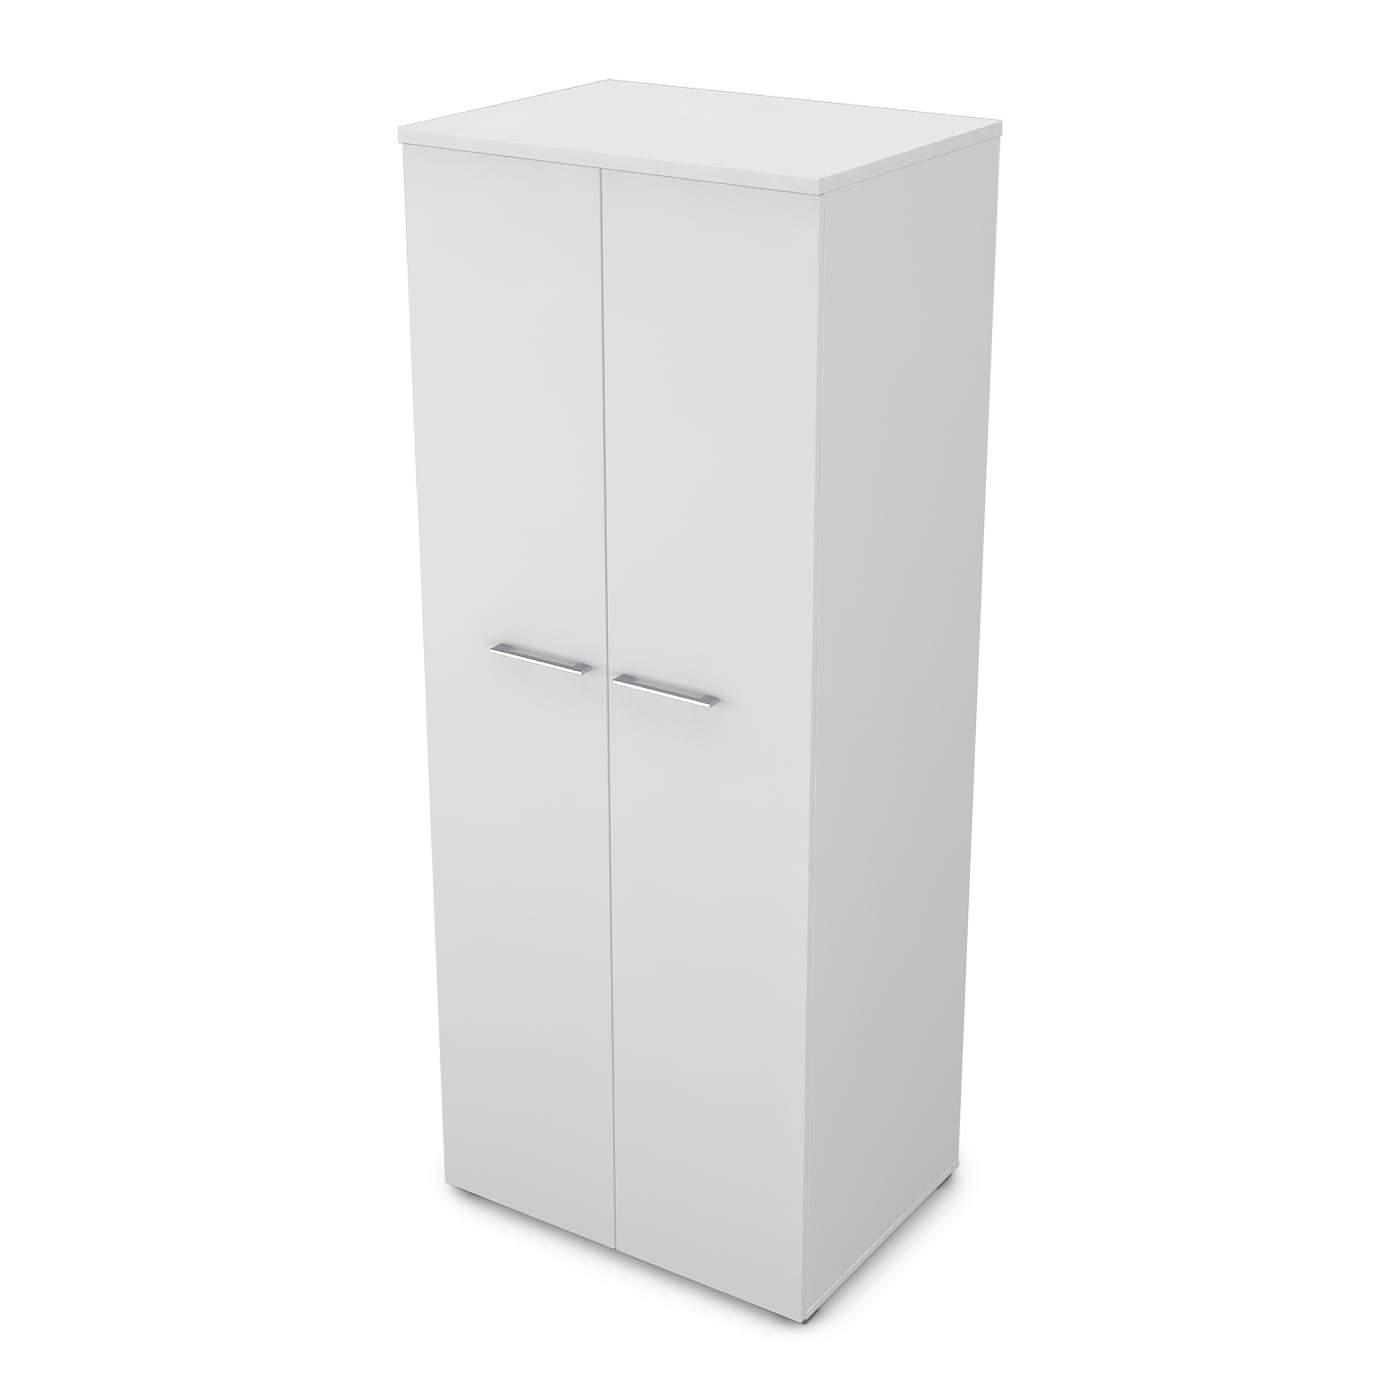 Шкаф для одежды 800x600x2045